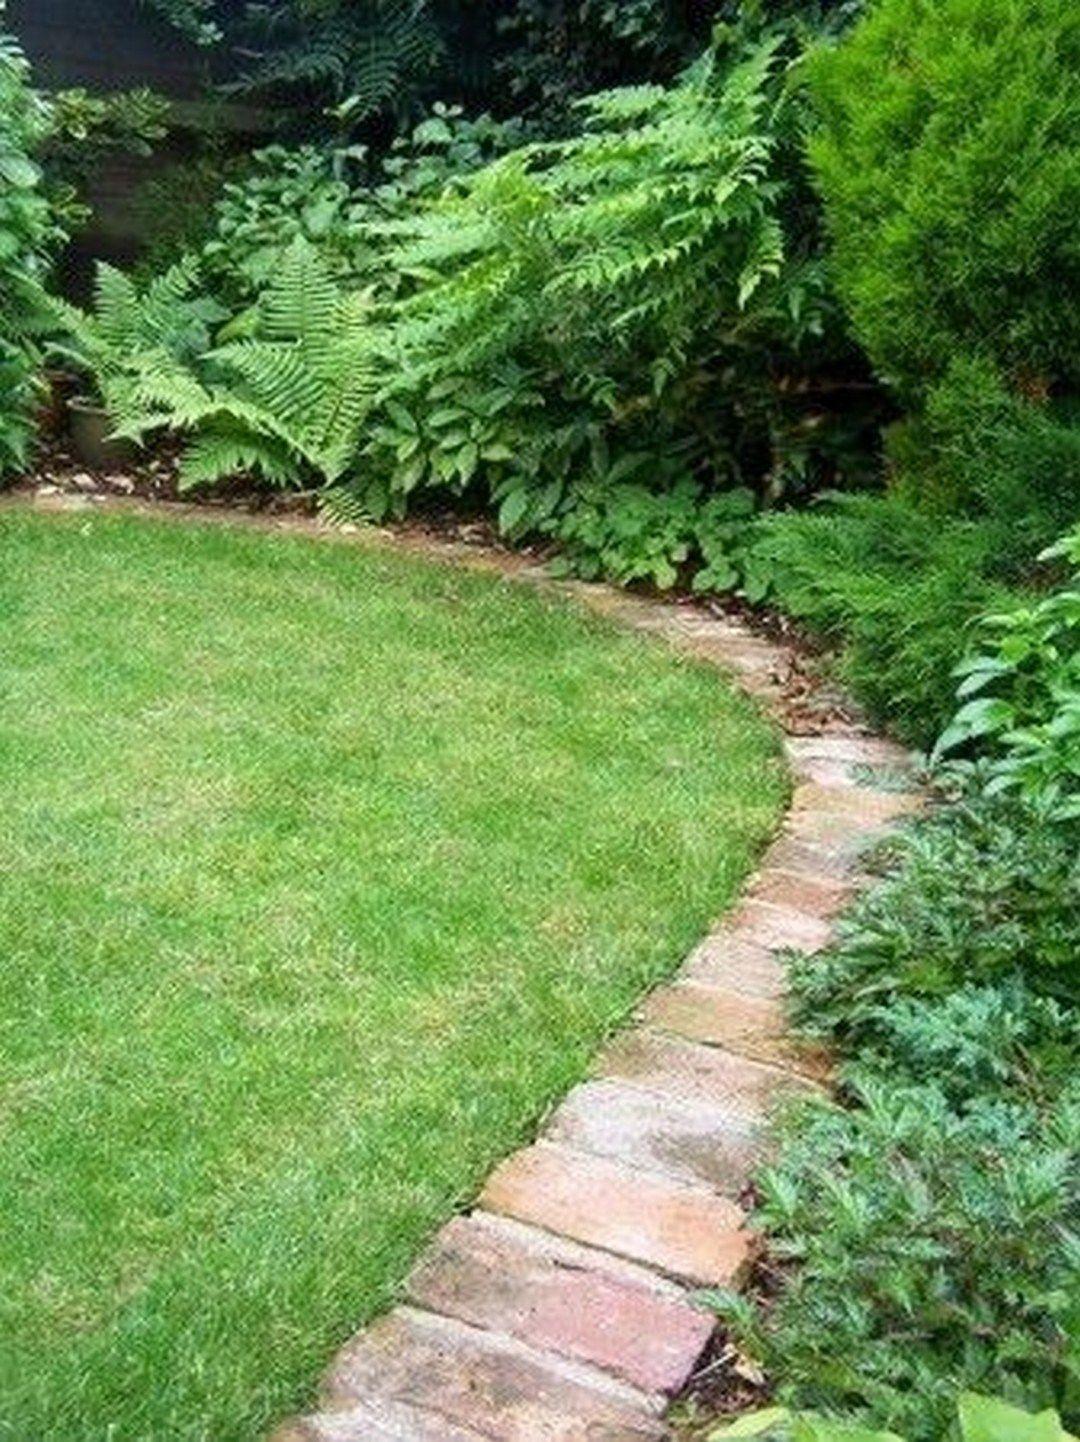 22 Garden Border Ideas To Dress Up Your Landscape Edging Alladecor Com Brick Landscape Edging Brick Garden Brick Garden Edging